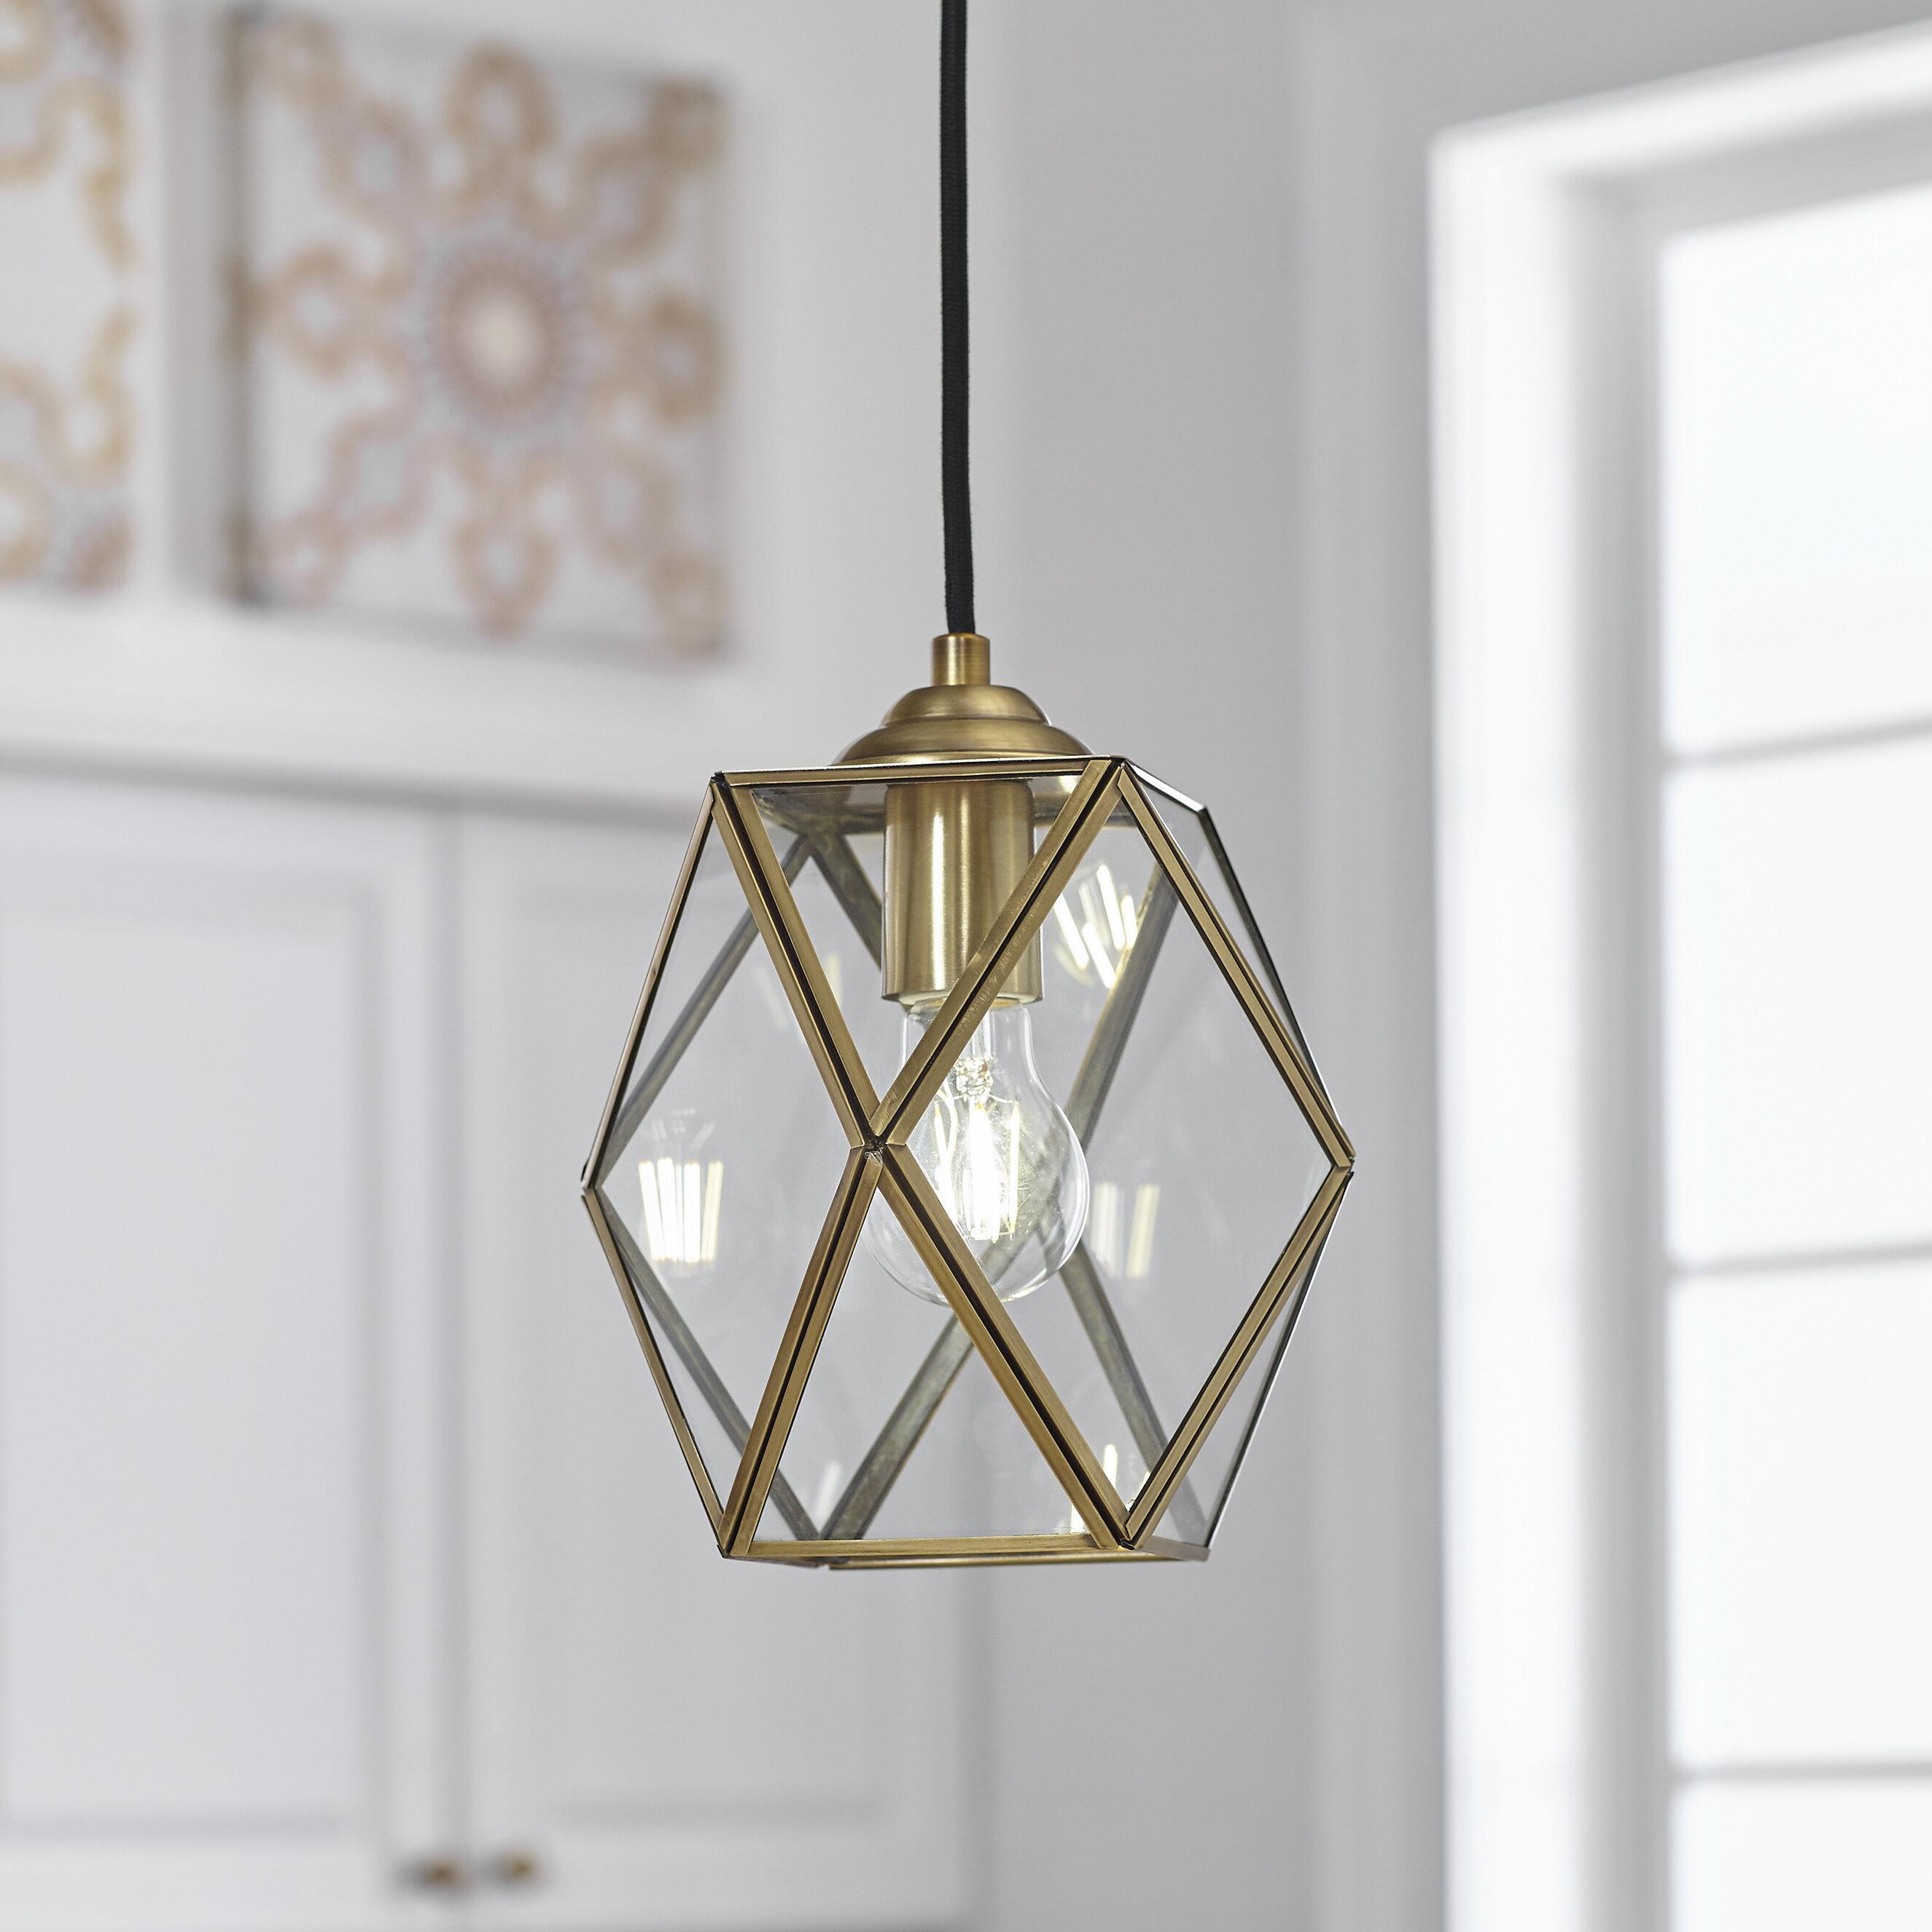 Pendant Light Modern Geometric Hollowed Out Globe Single Light Dining Area Lamp Home Garden Ceiling Fixture